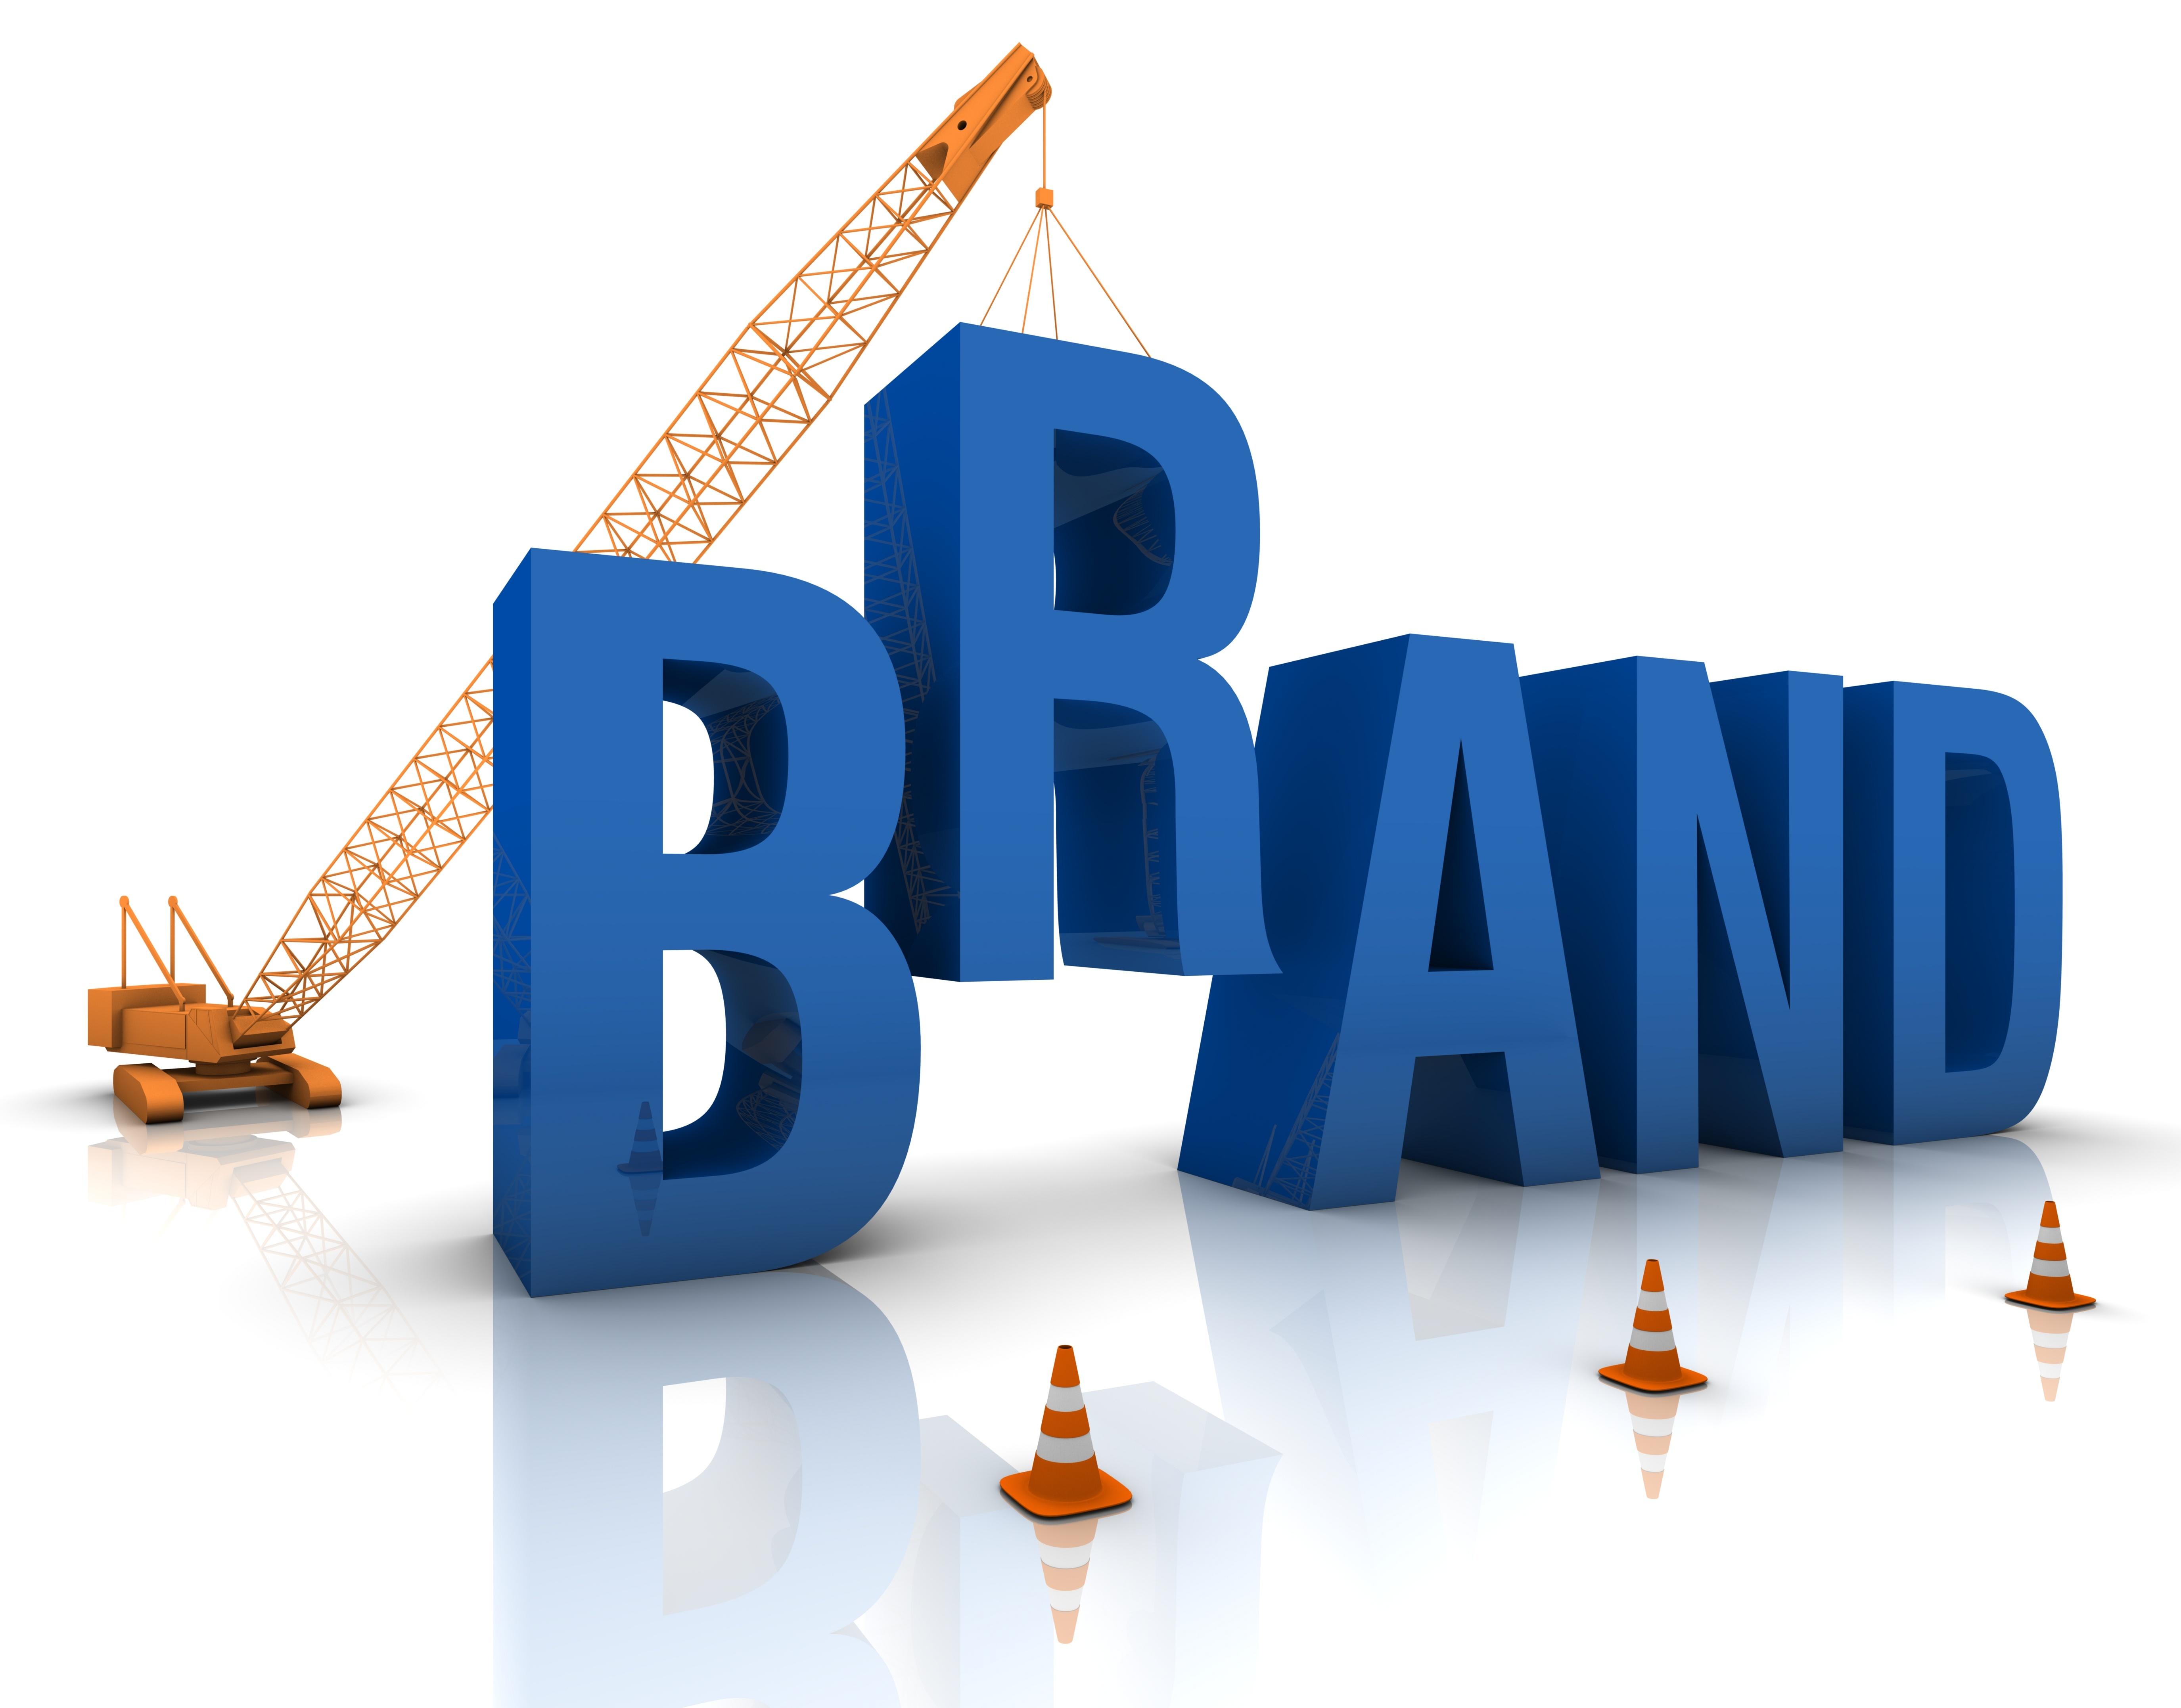 Brand building